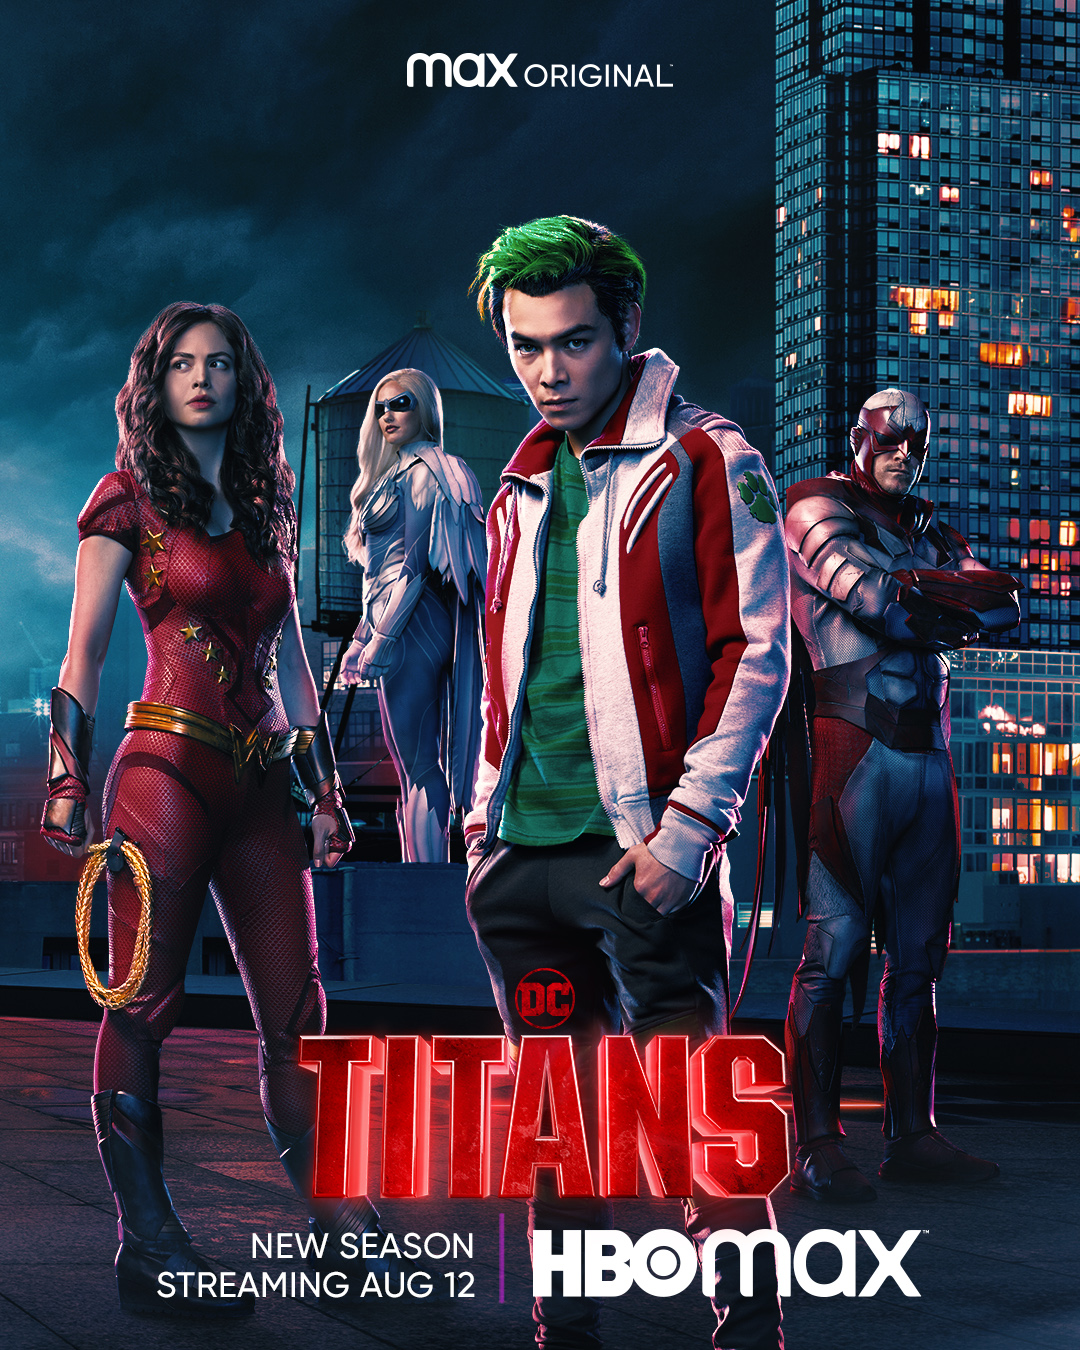 "Donna Troy/Wonder Girl (Conor Leslie), Dawn Granger/Dove (Minka Kelly), Garfield  ""Gar"" Logan/Beast Boy (Ryan Potter) y Hank Hall/Hawk (Alan Ritchson) en un póster promocional de la temporada 3 de Titans. Imagen: DC Titans on Max Twitter (@DCTitans)."